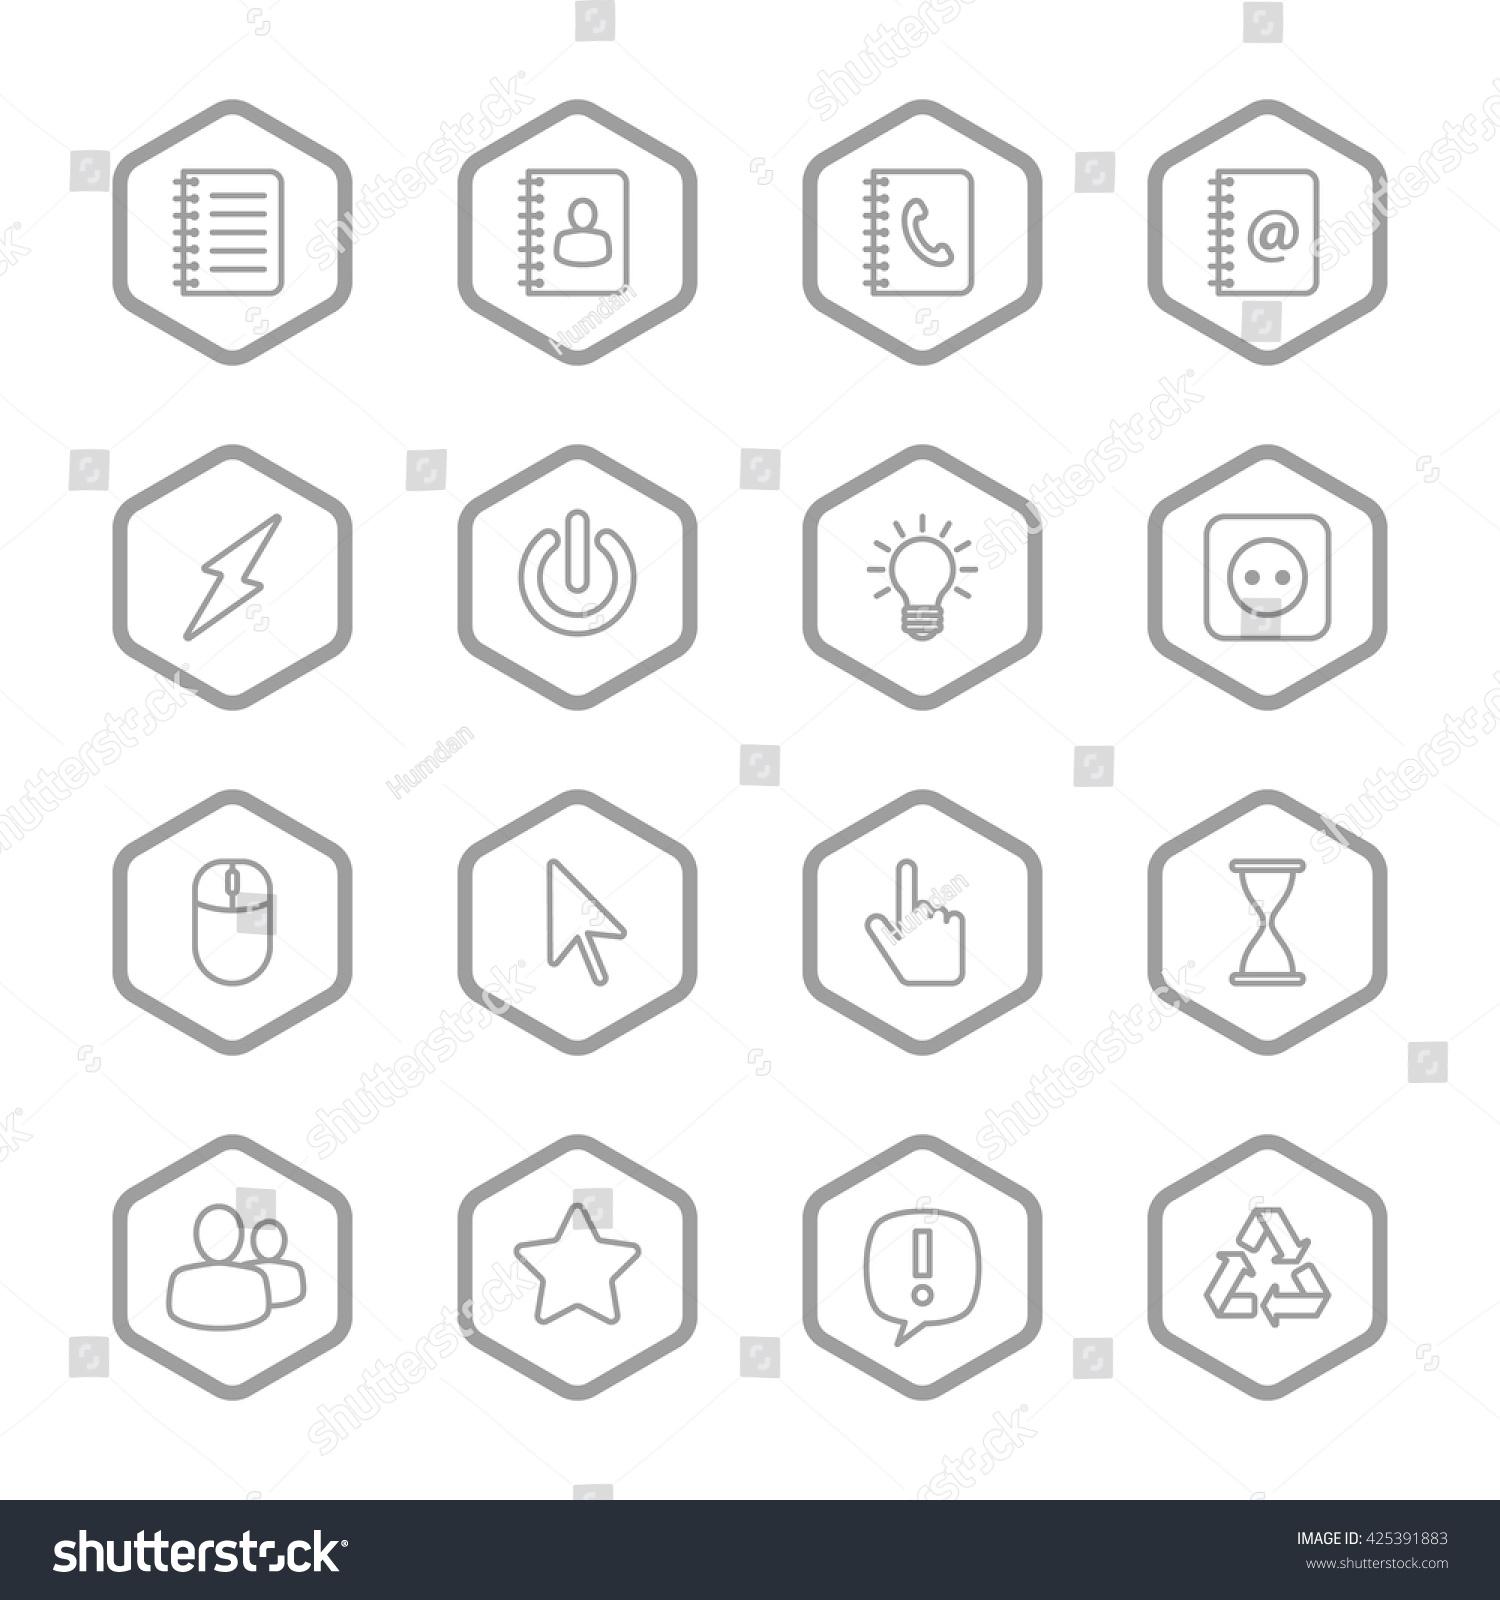 Gray Line Web Icon Set Hexagon Stock Vector 425391883 - Shutterstock